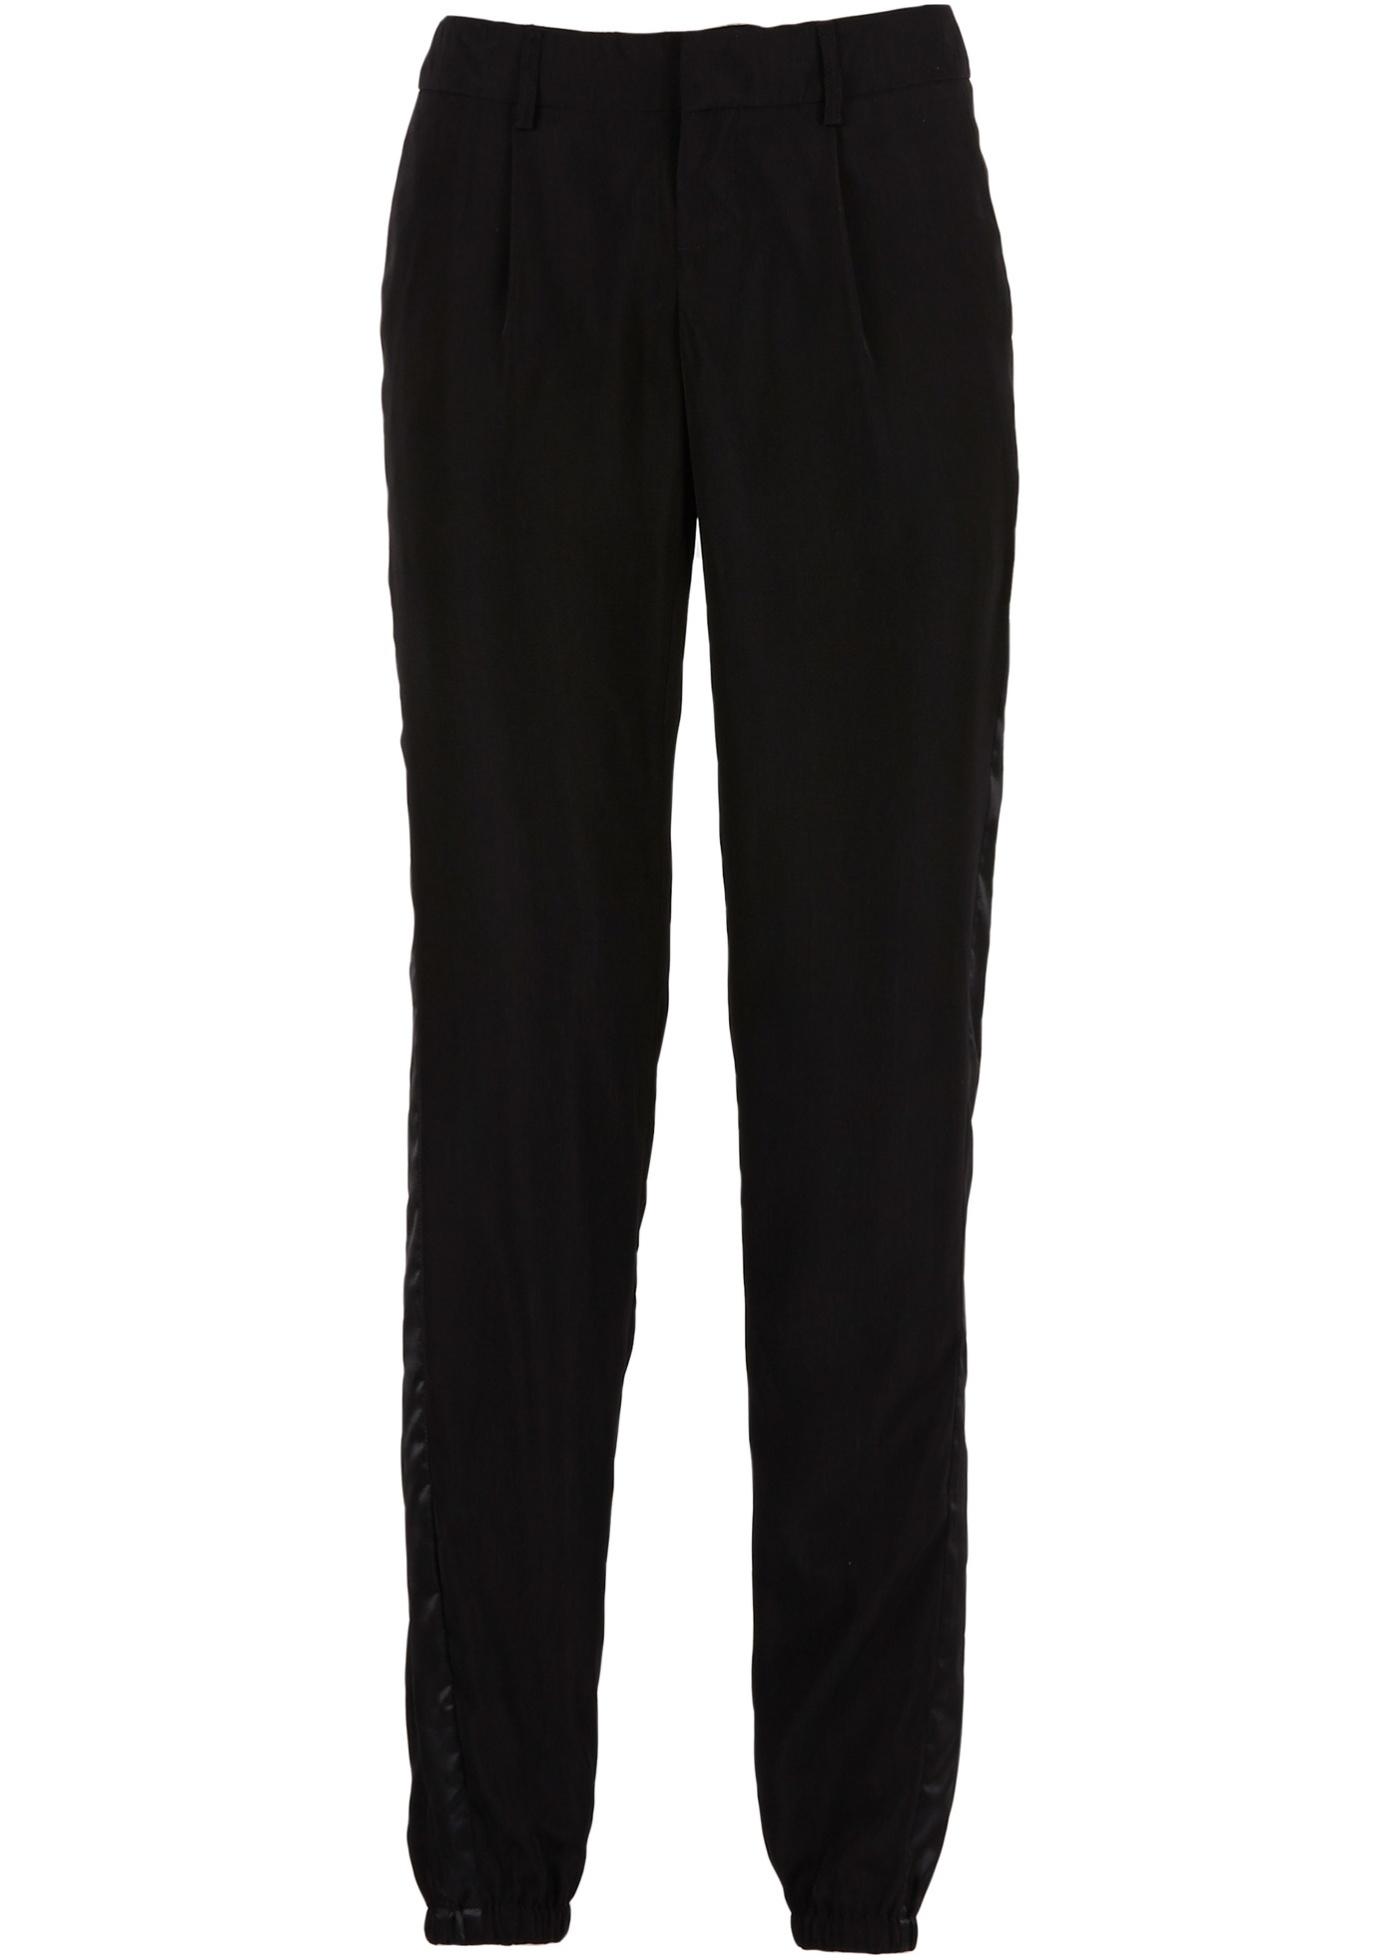 Pantalon de smoking noir femme - bonprix